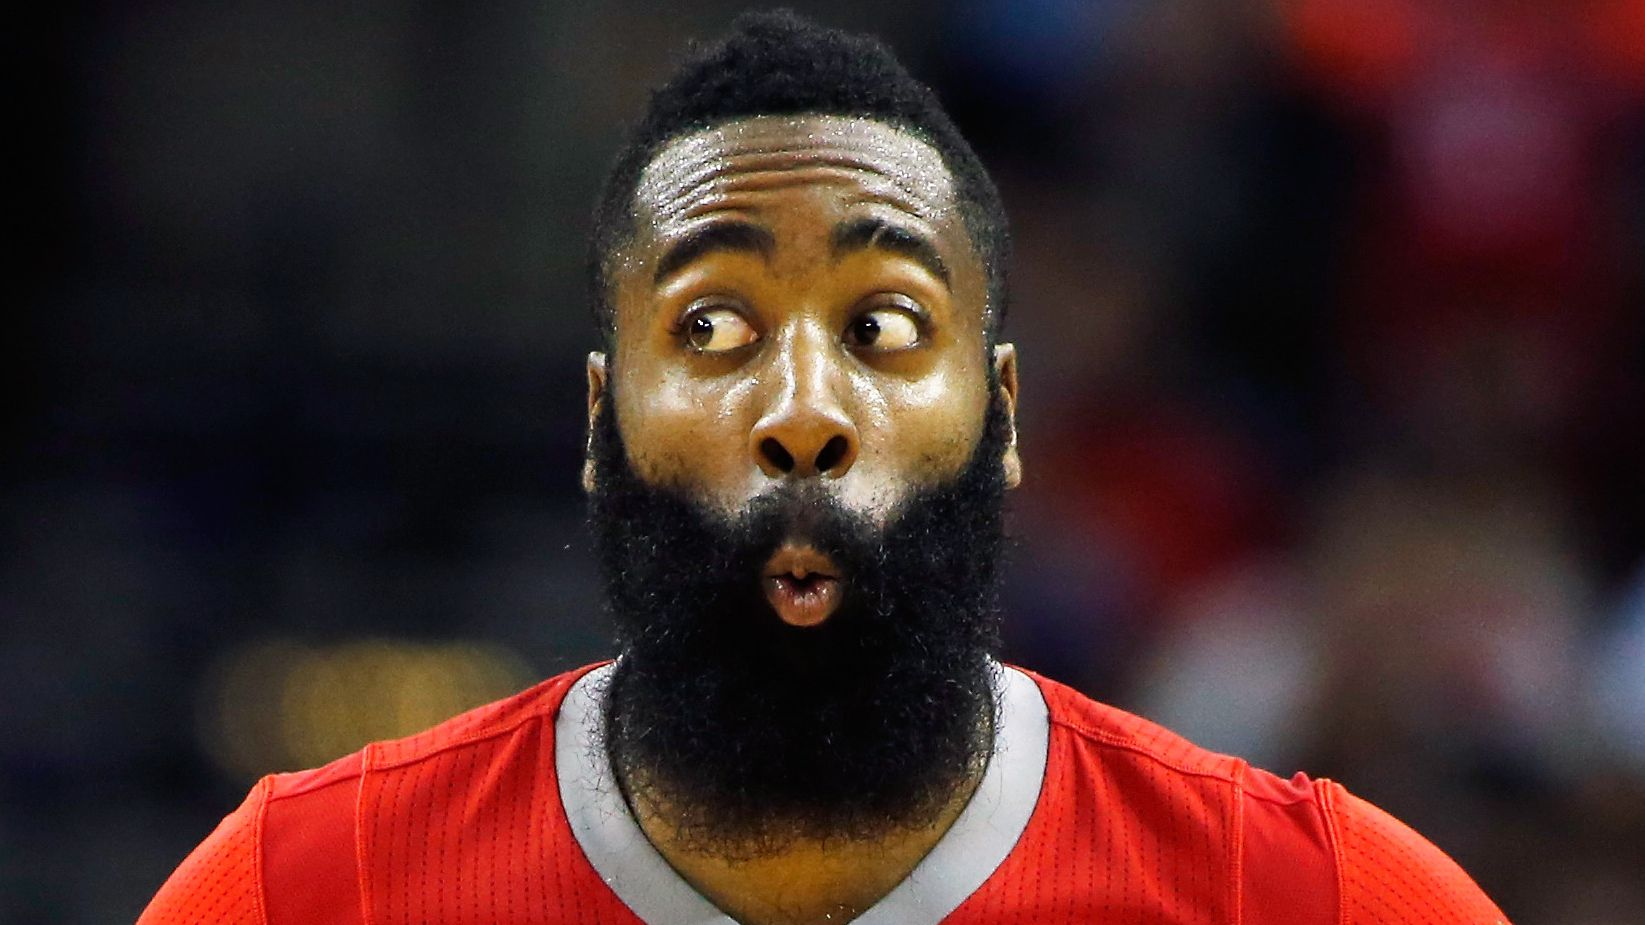 James Harden of the Houston Rockets.